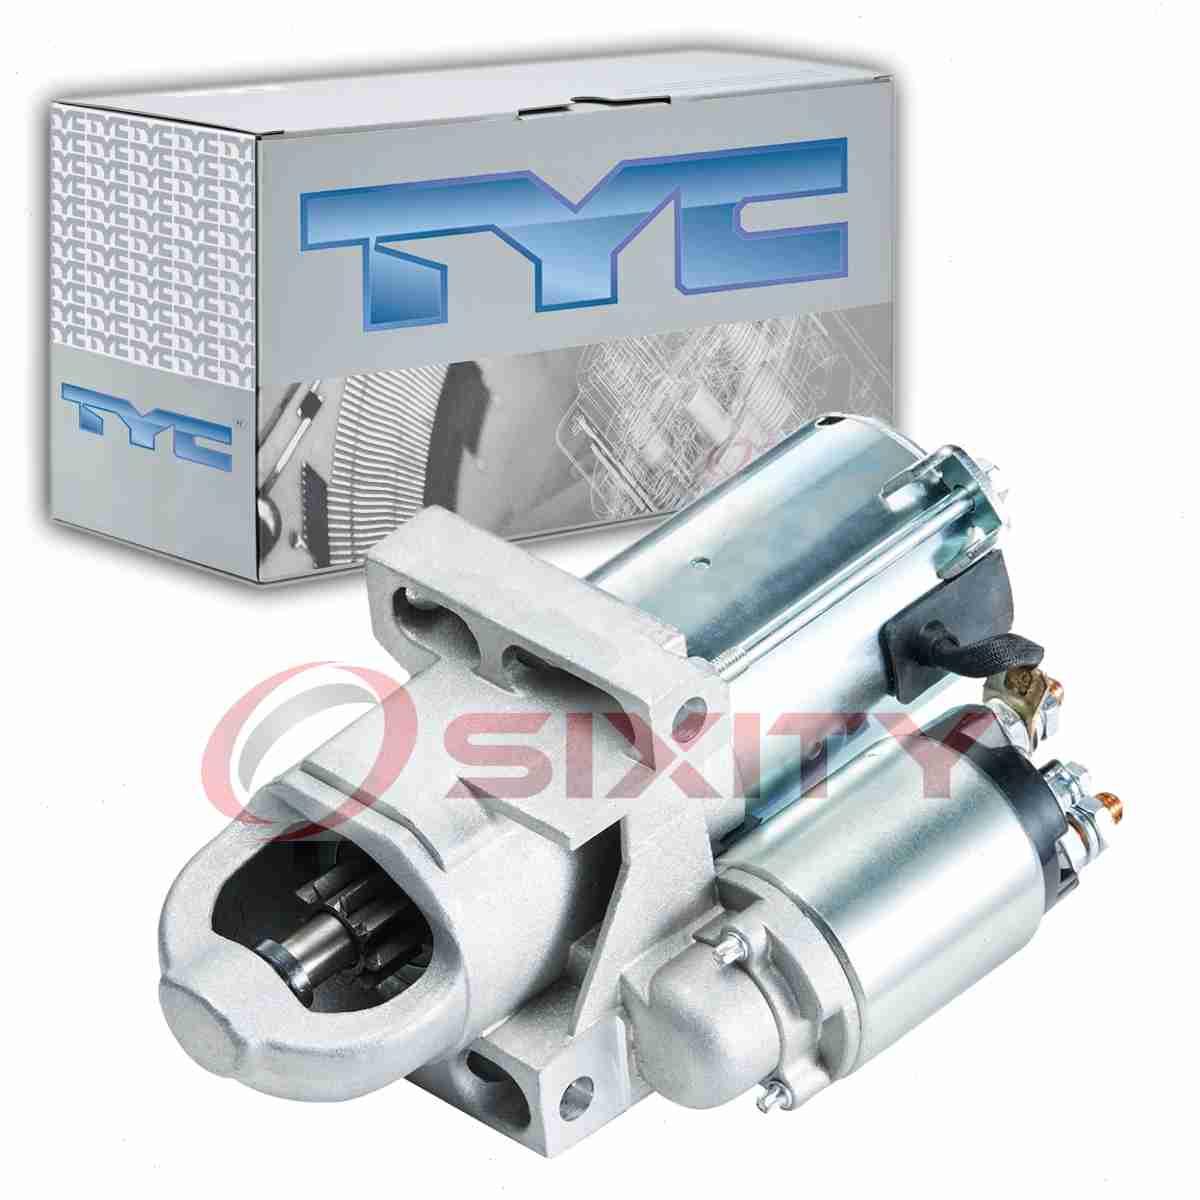 WC Fit Drum Brake Wheel Cylinder Rear W37994 WC37994 1994-1997 Ford Aspire